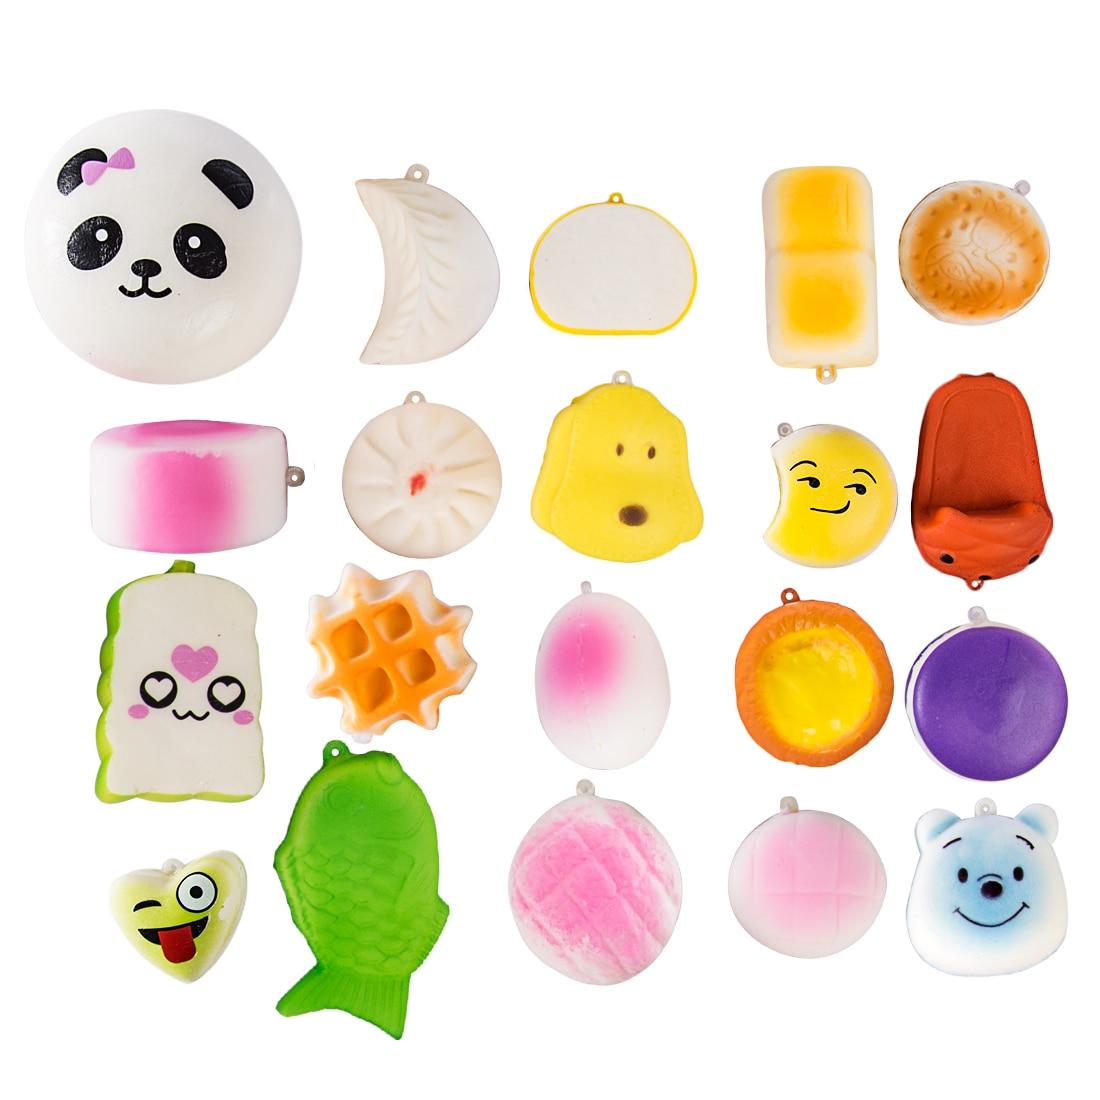 20/30 Pcs Fresh Scent Soft Slow Rebound Squish Decompression Learning Toys For Children Set - Random Assortment